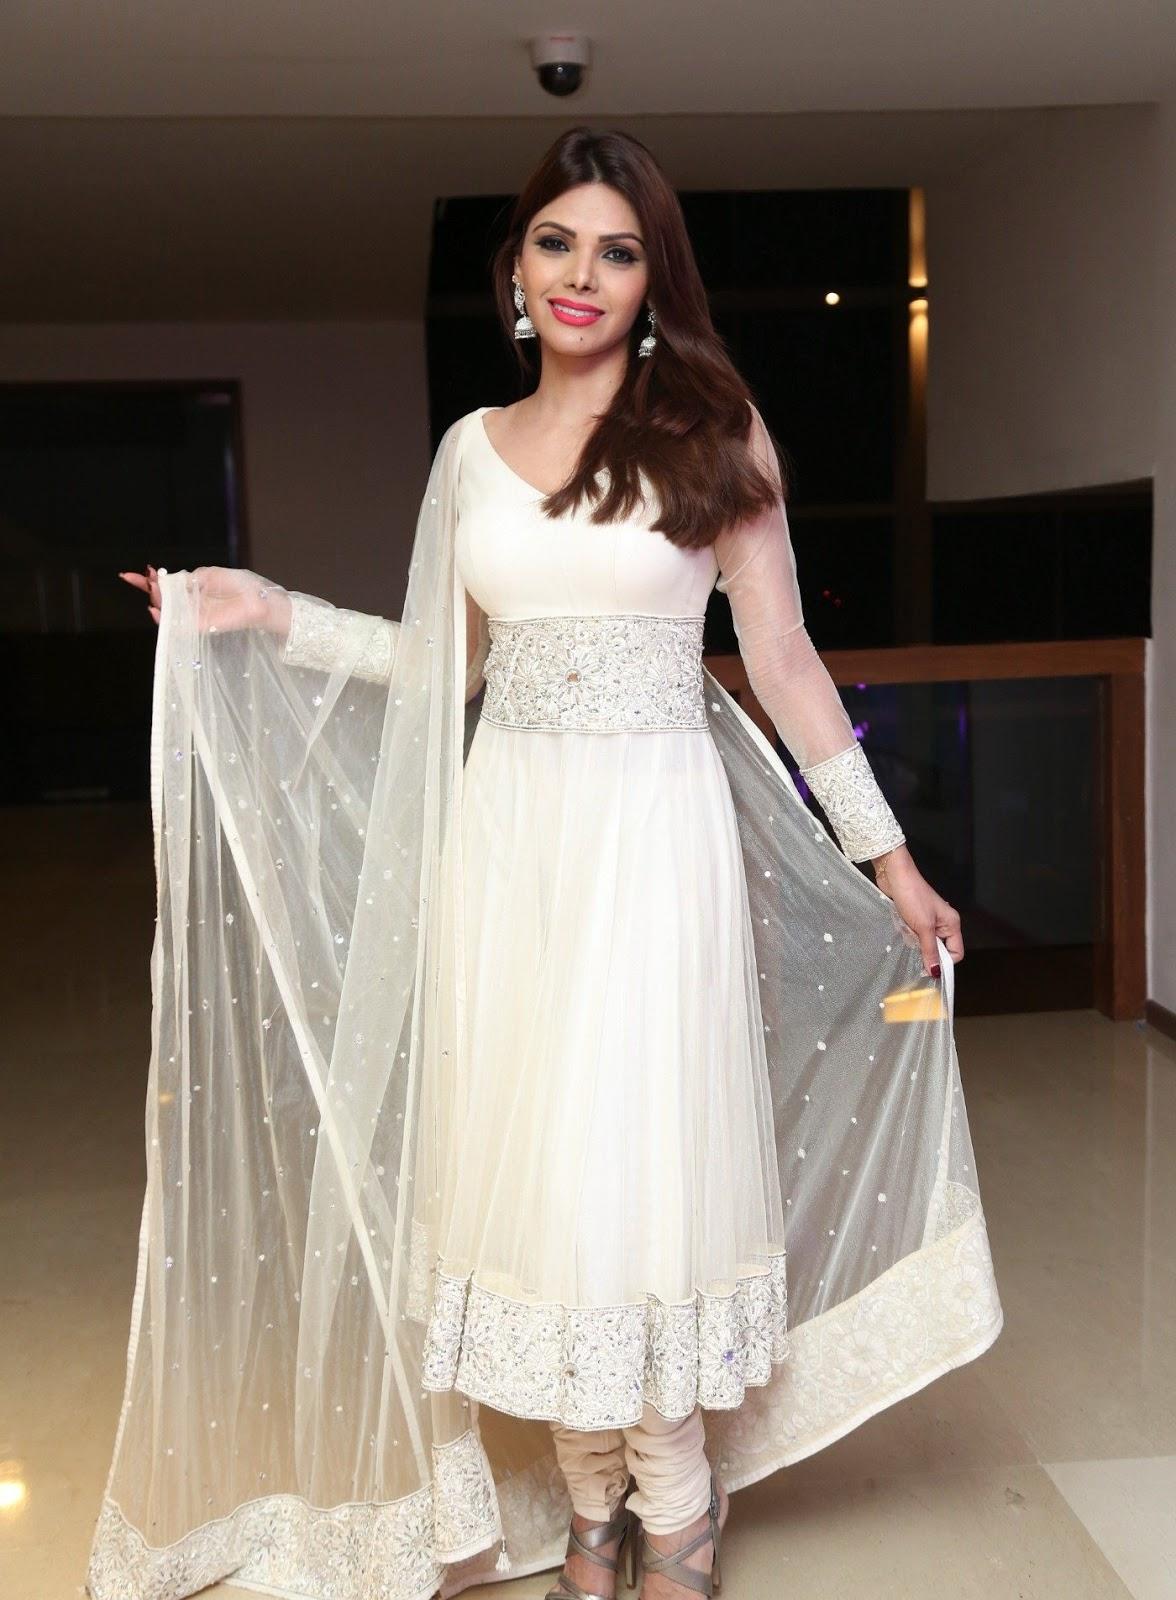 Sherlyn Chopra Looks Super Hot In White Dress At Dj Inayah -6176